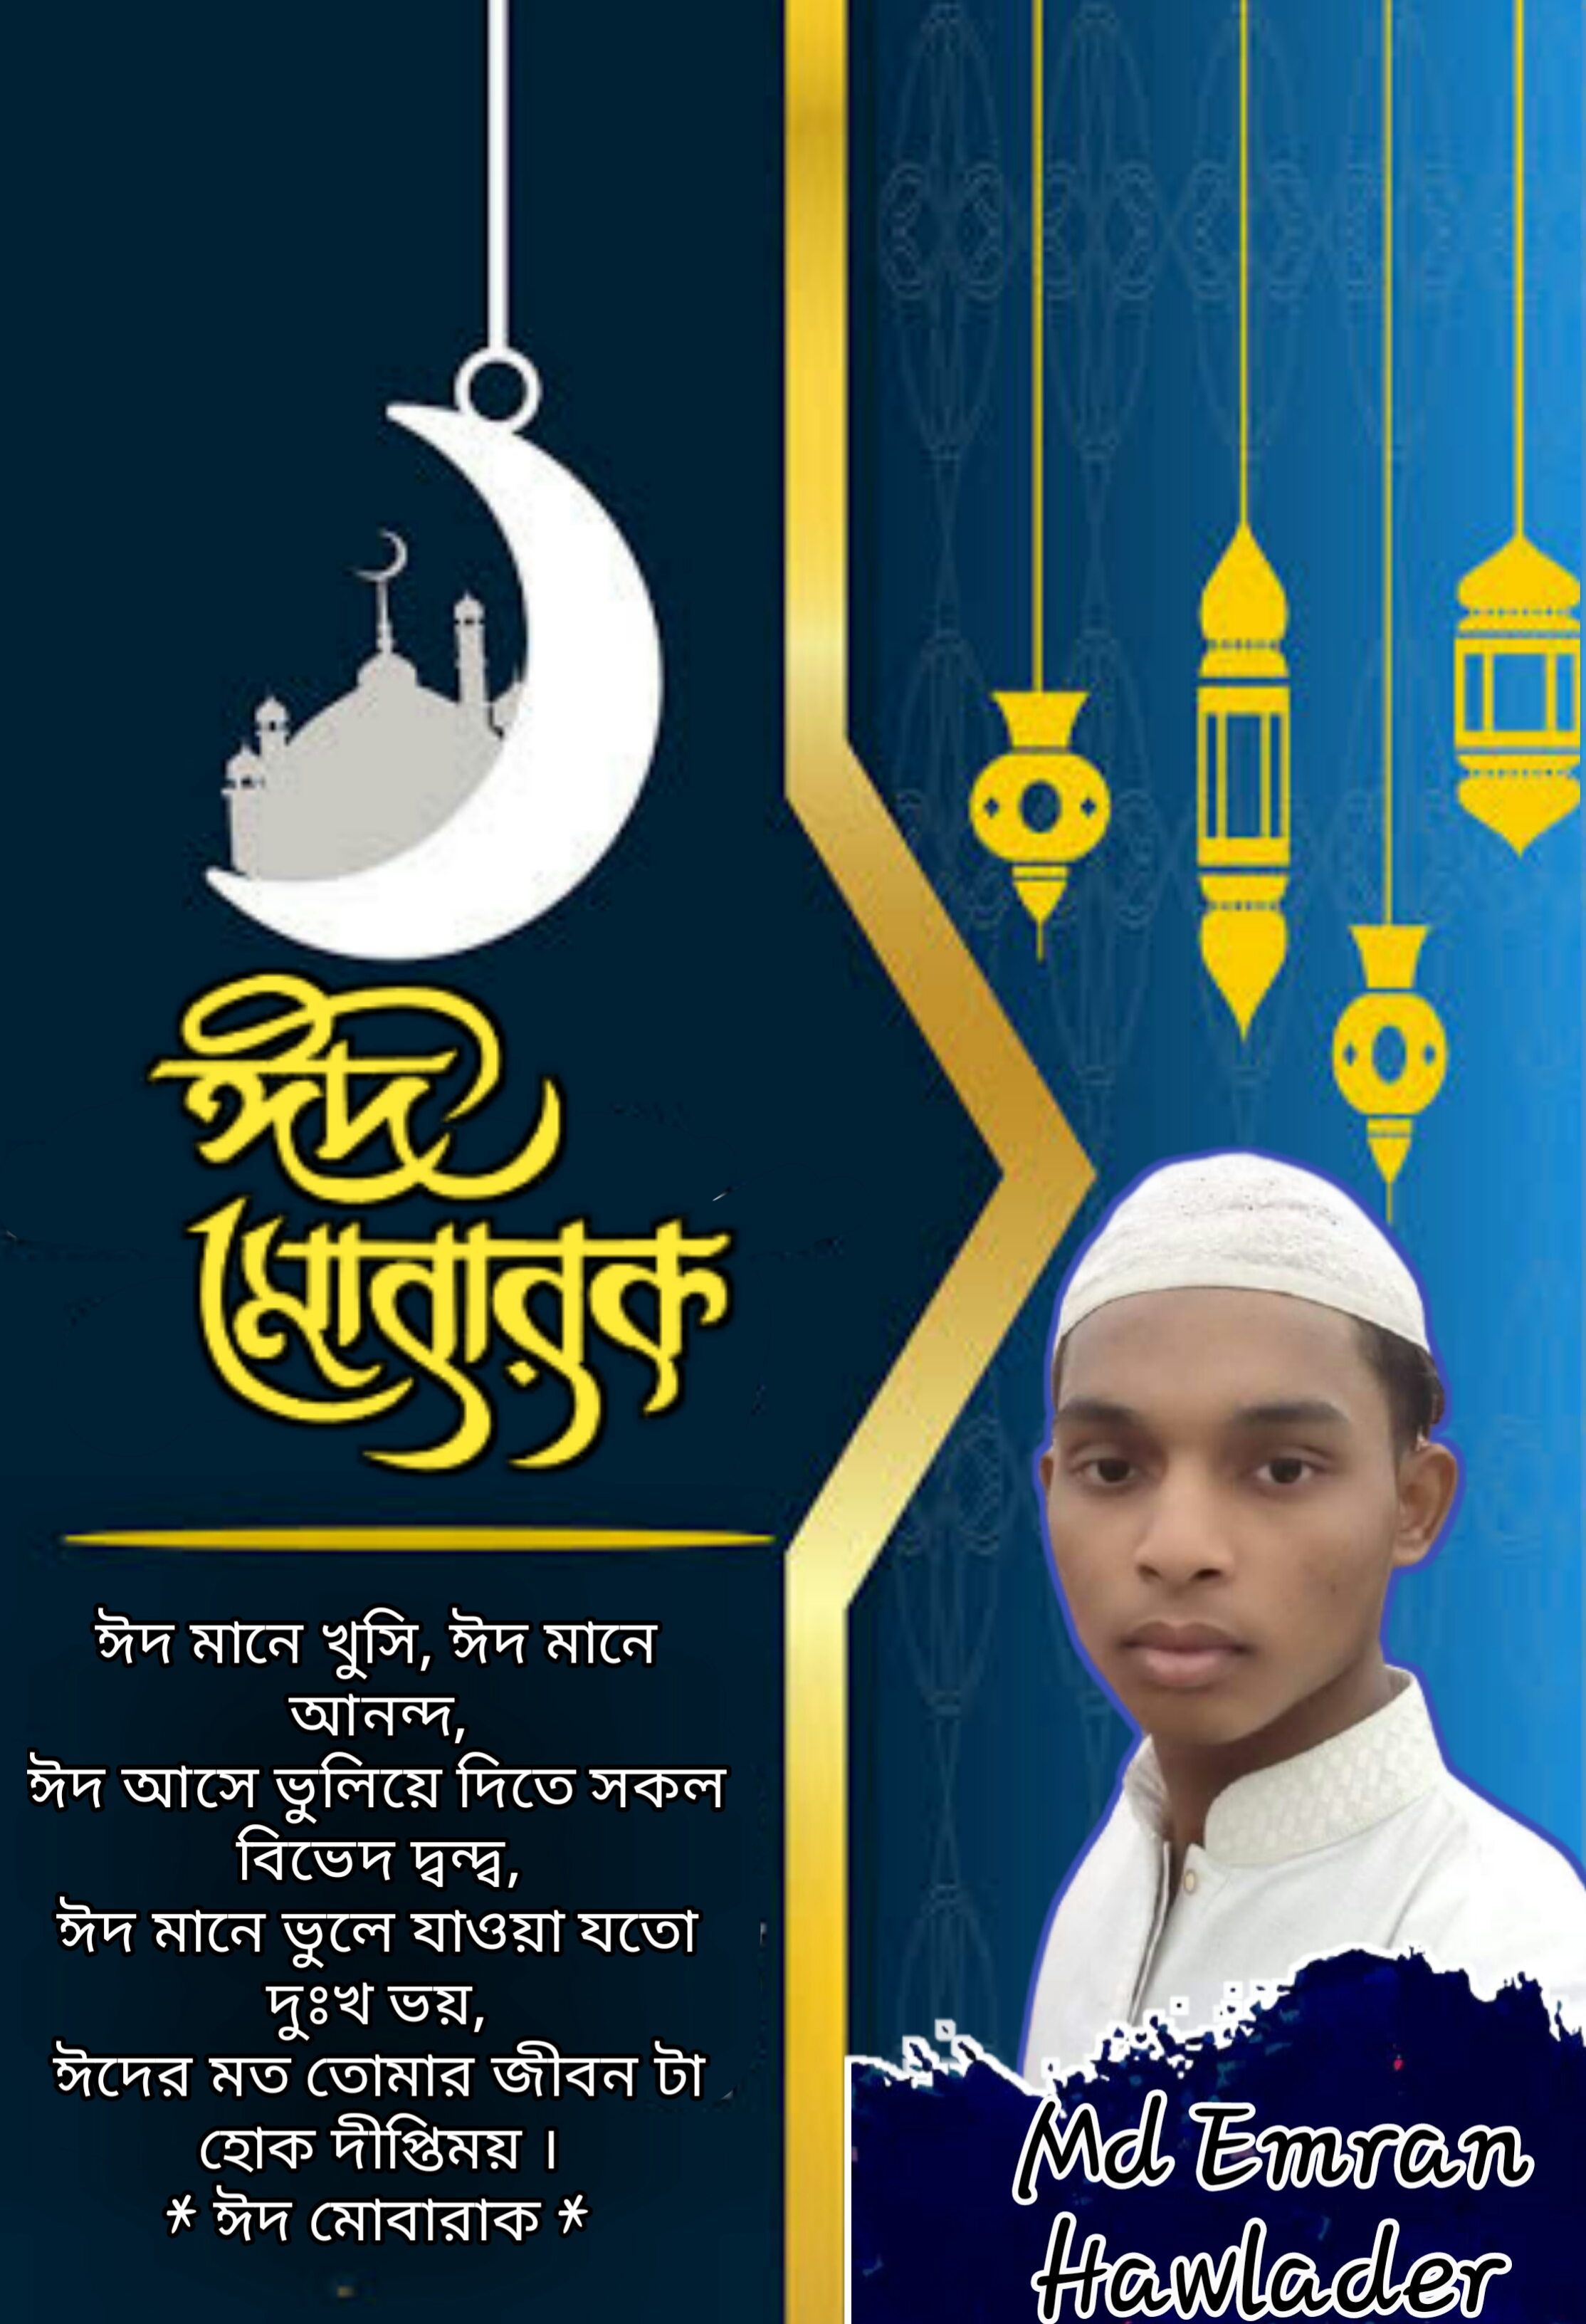 Eid Poster design, ( 3 )  ঈদুল আযহা পোস্টার ডিজাইন ( ৩ )